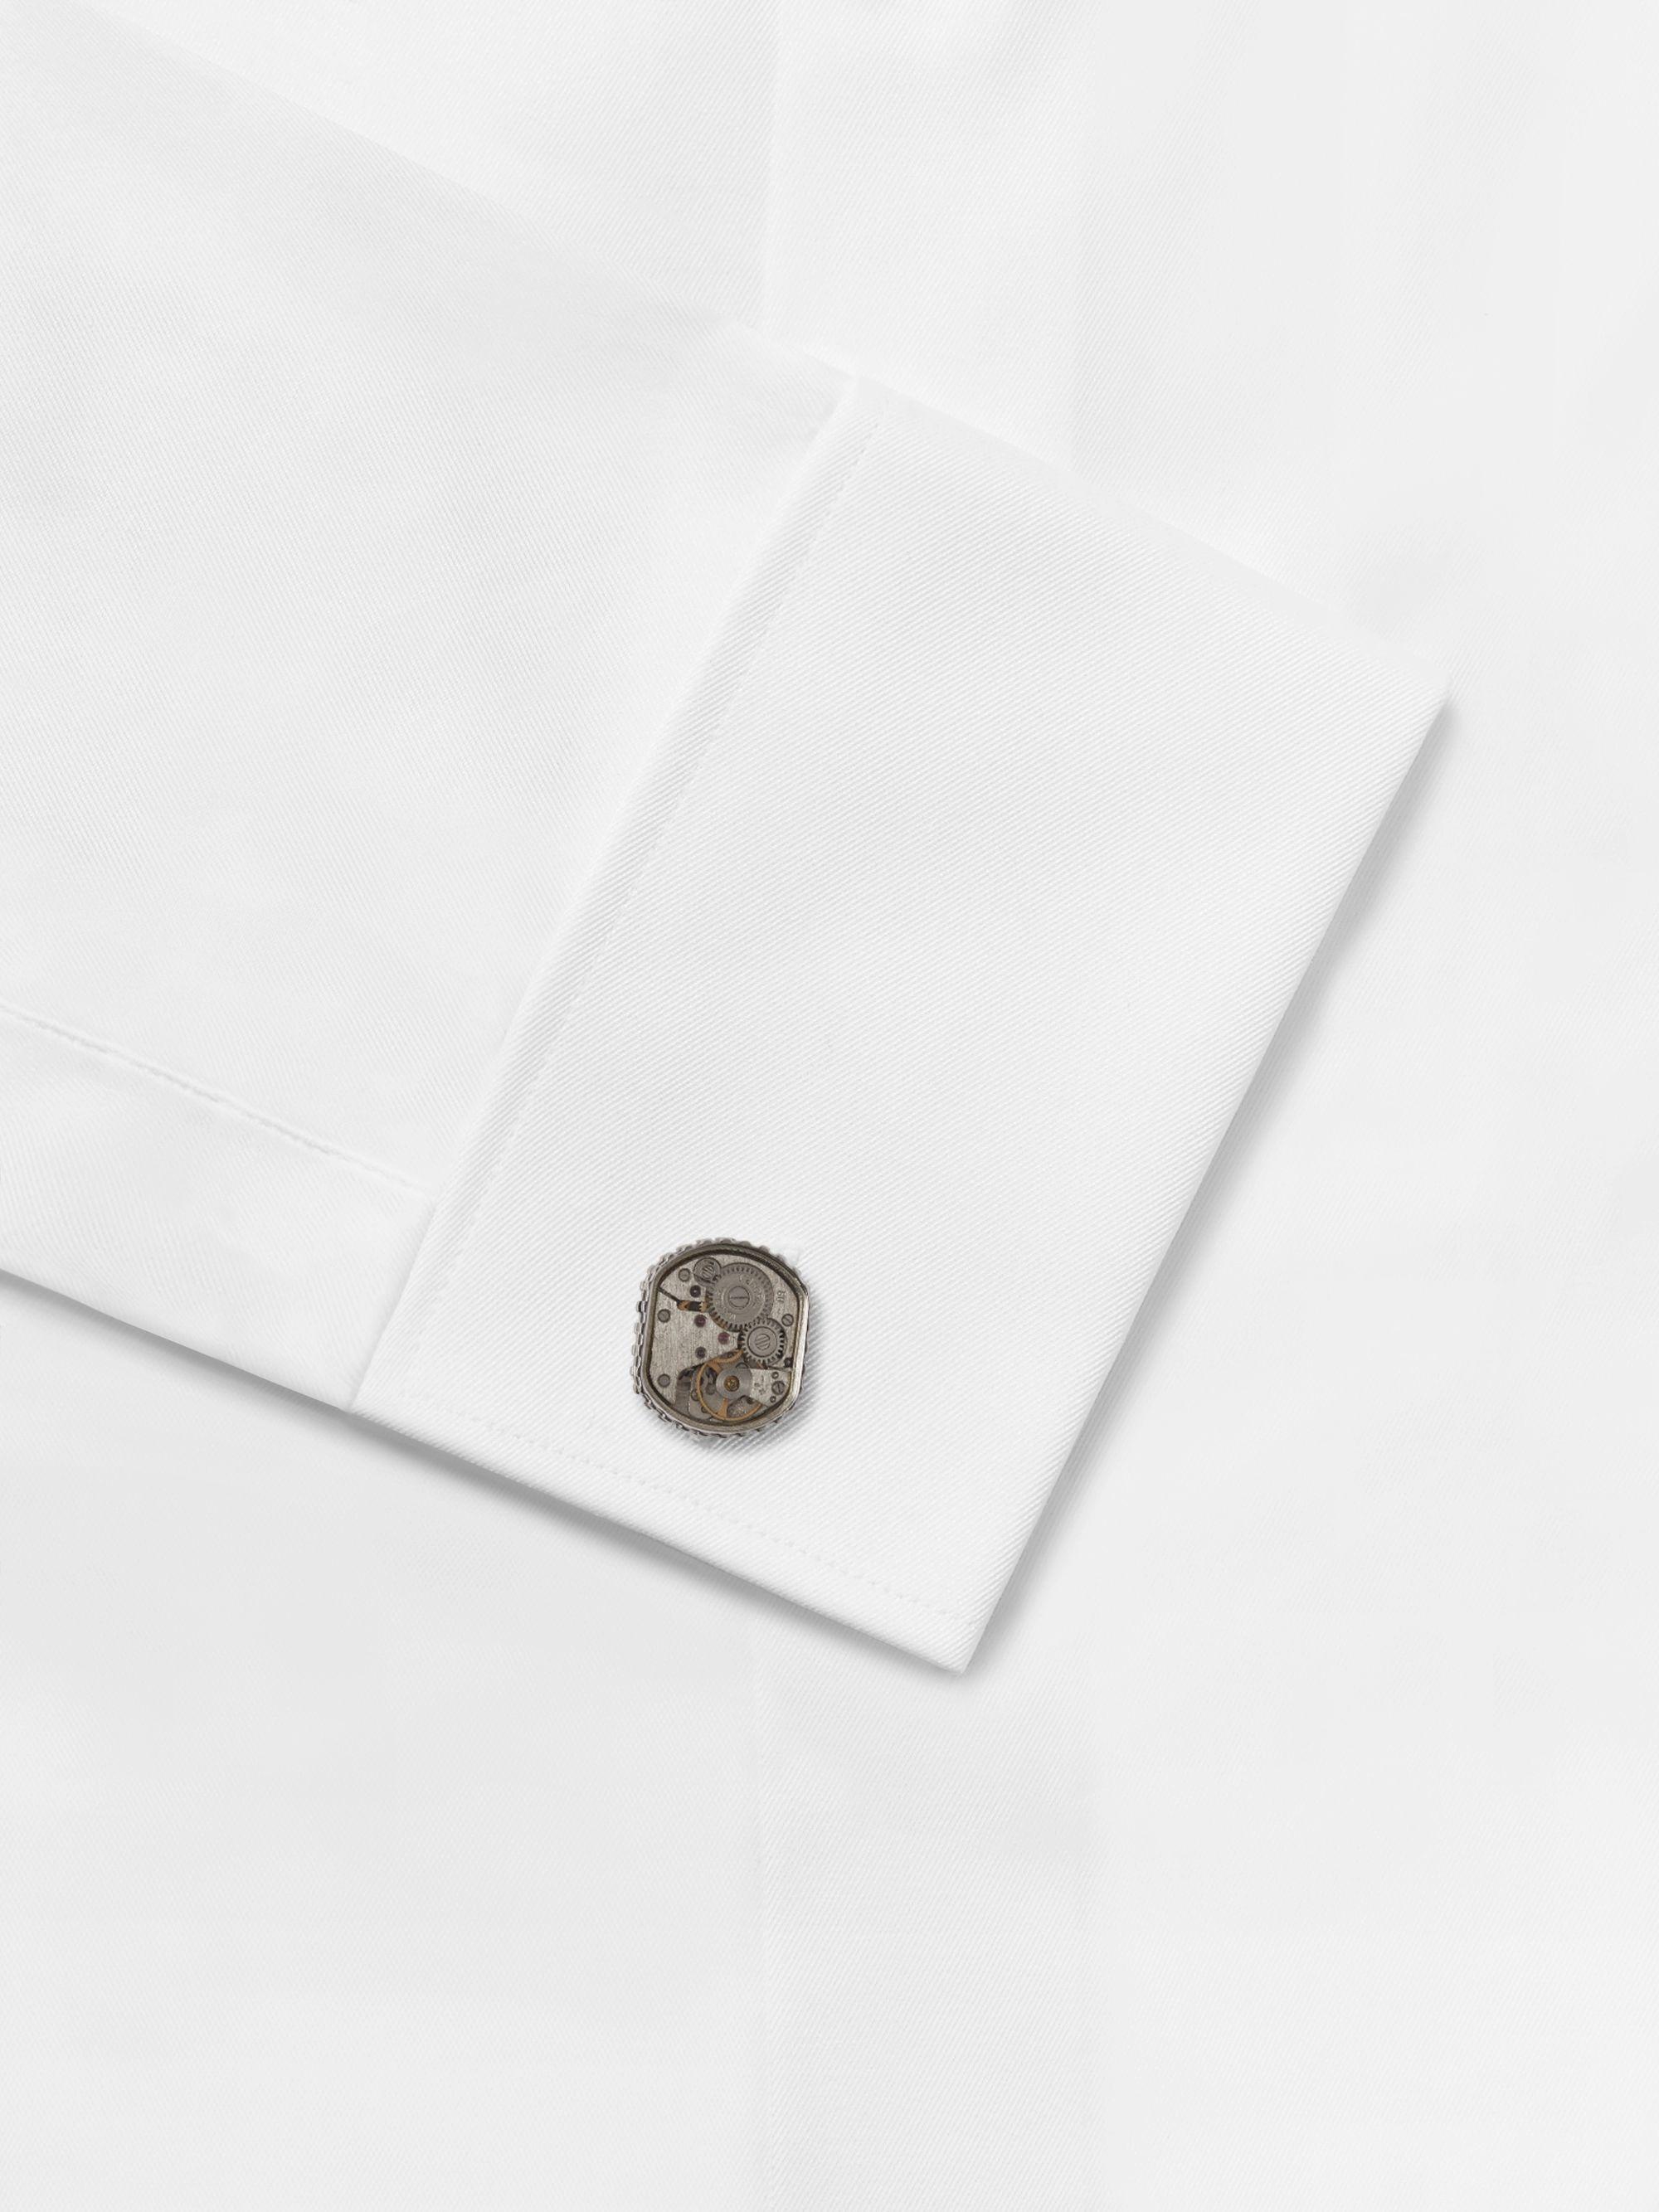 Silver Gear Silver-tone Cufflinks | Tateossian